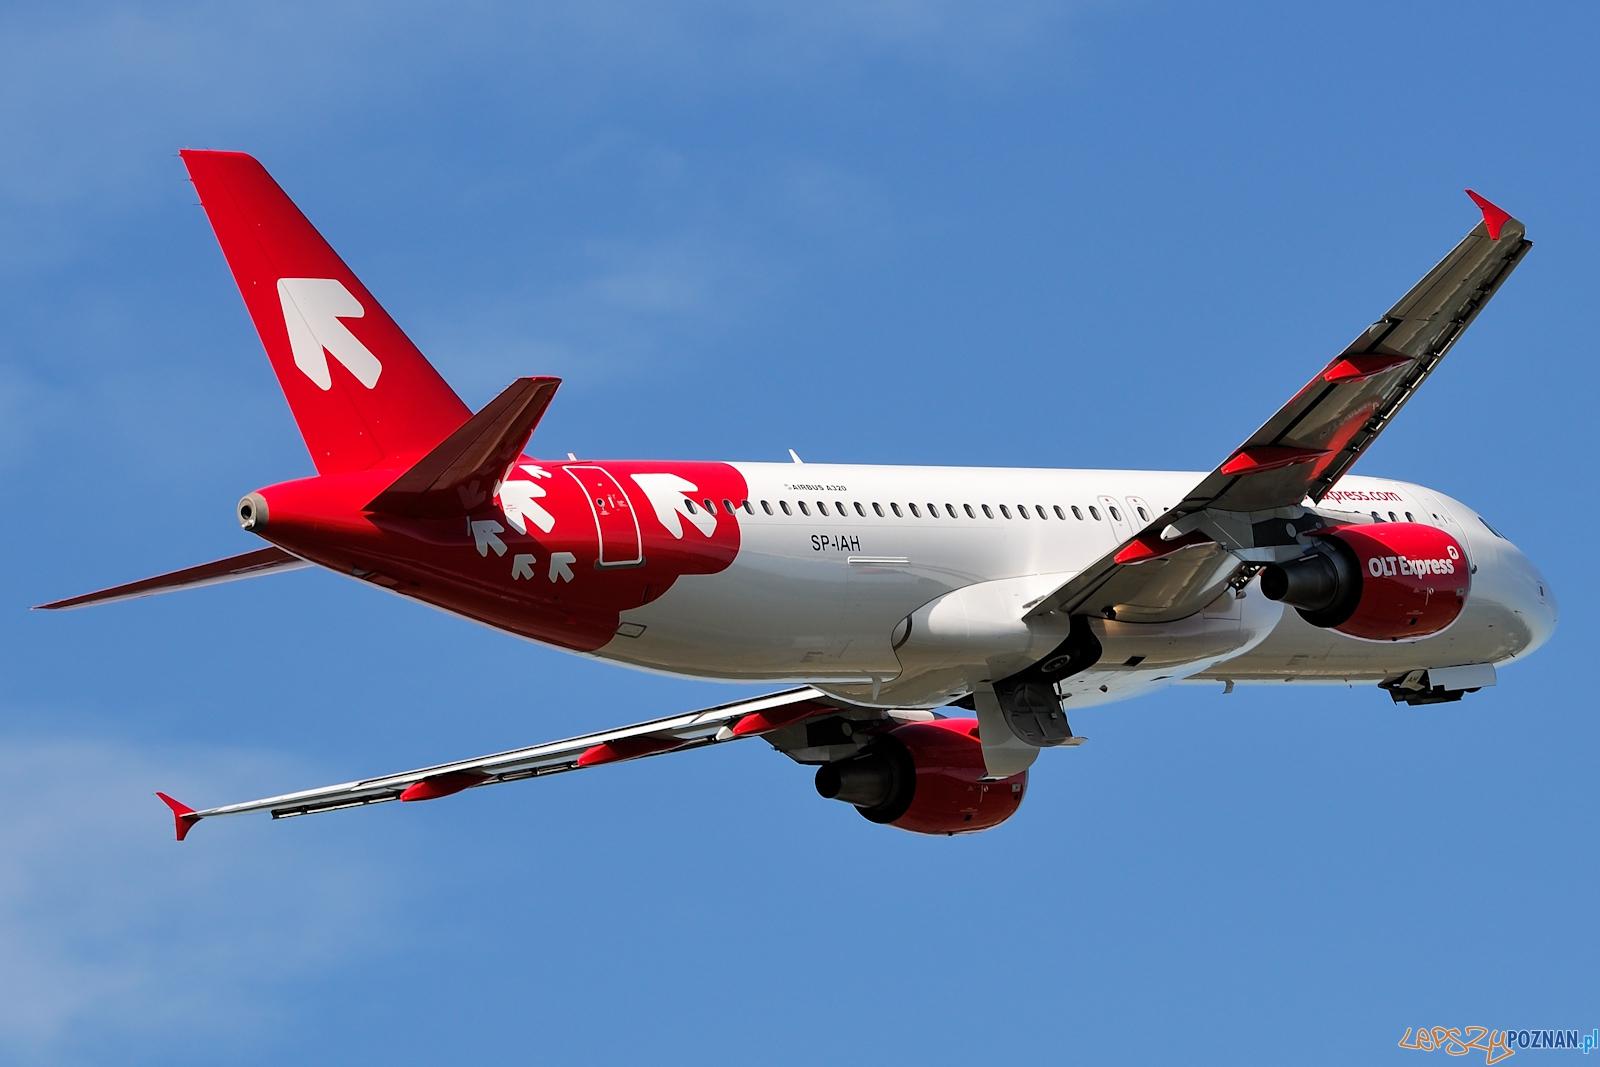 Samolot OLT Express  Foto: materiały prasowe